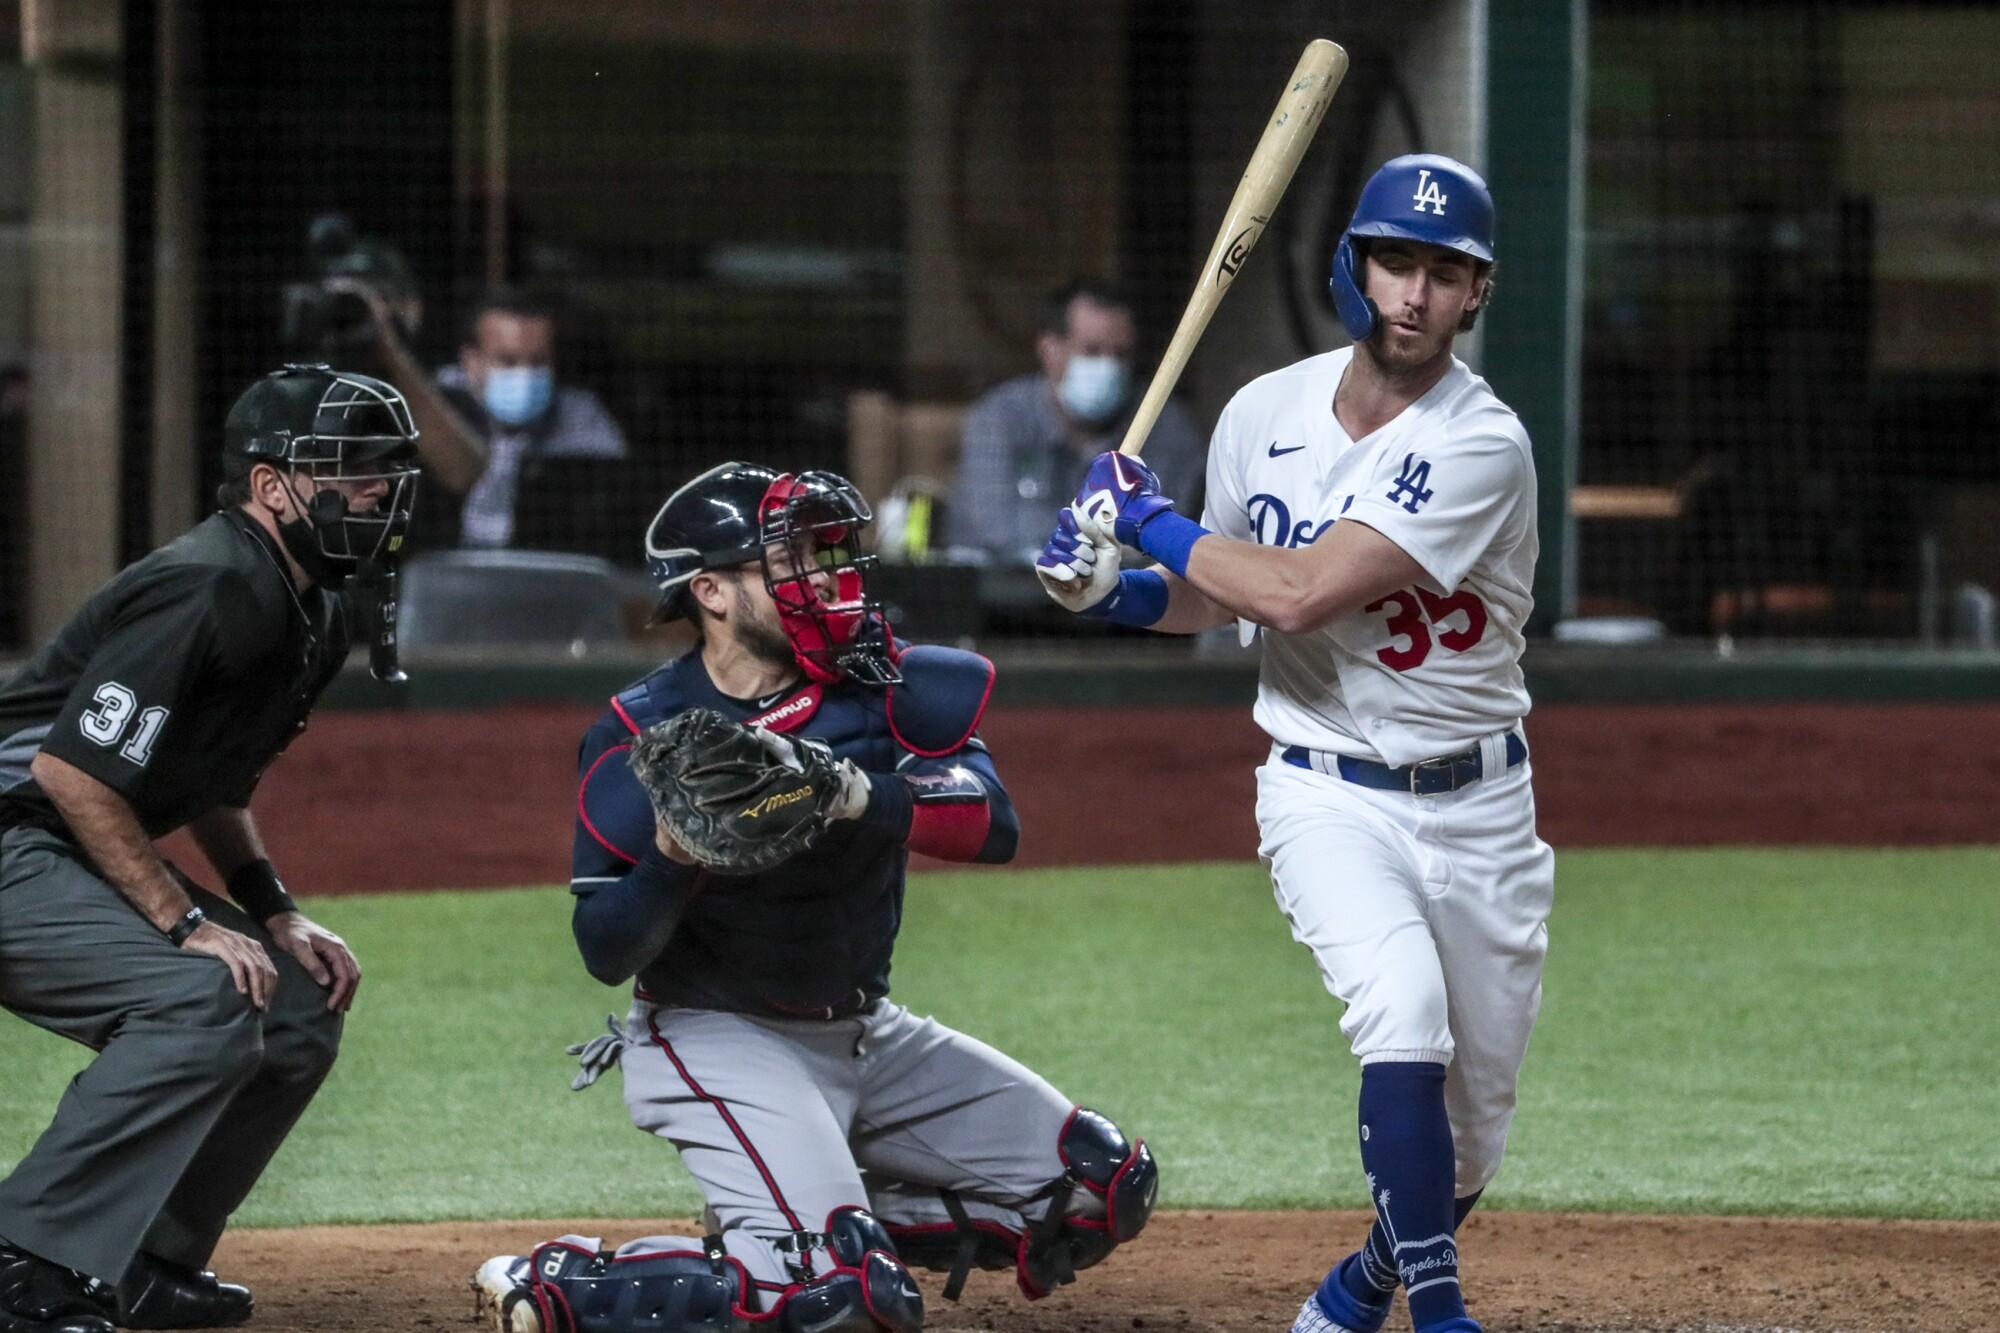 Dodgers center fielder Cody Bellinger strikes out during the fourth inning against the Atlanta Braves.